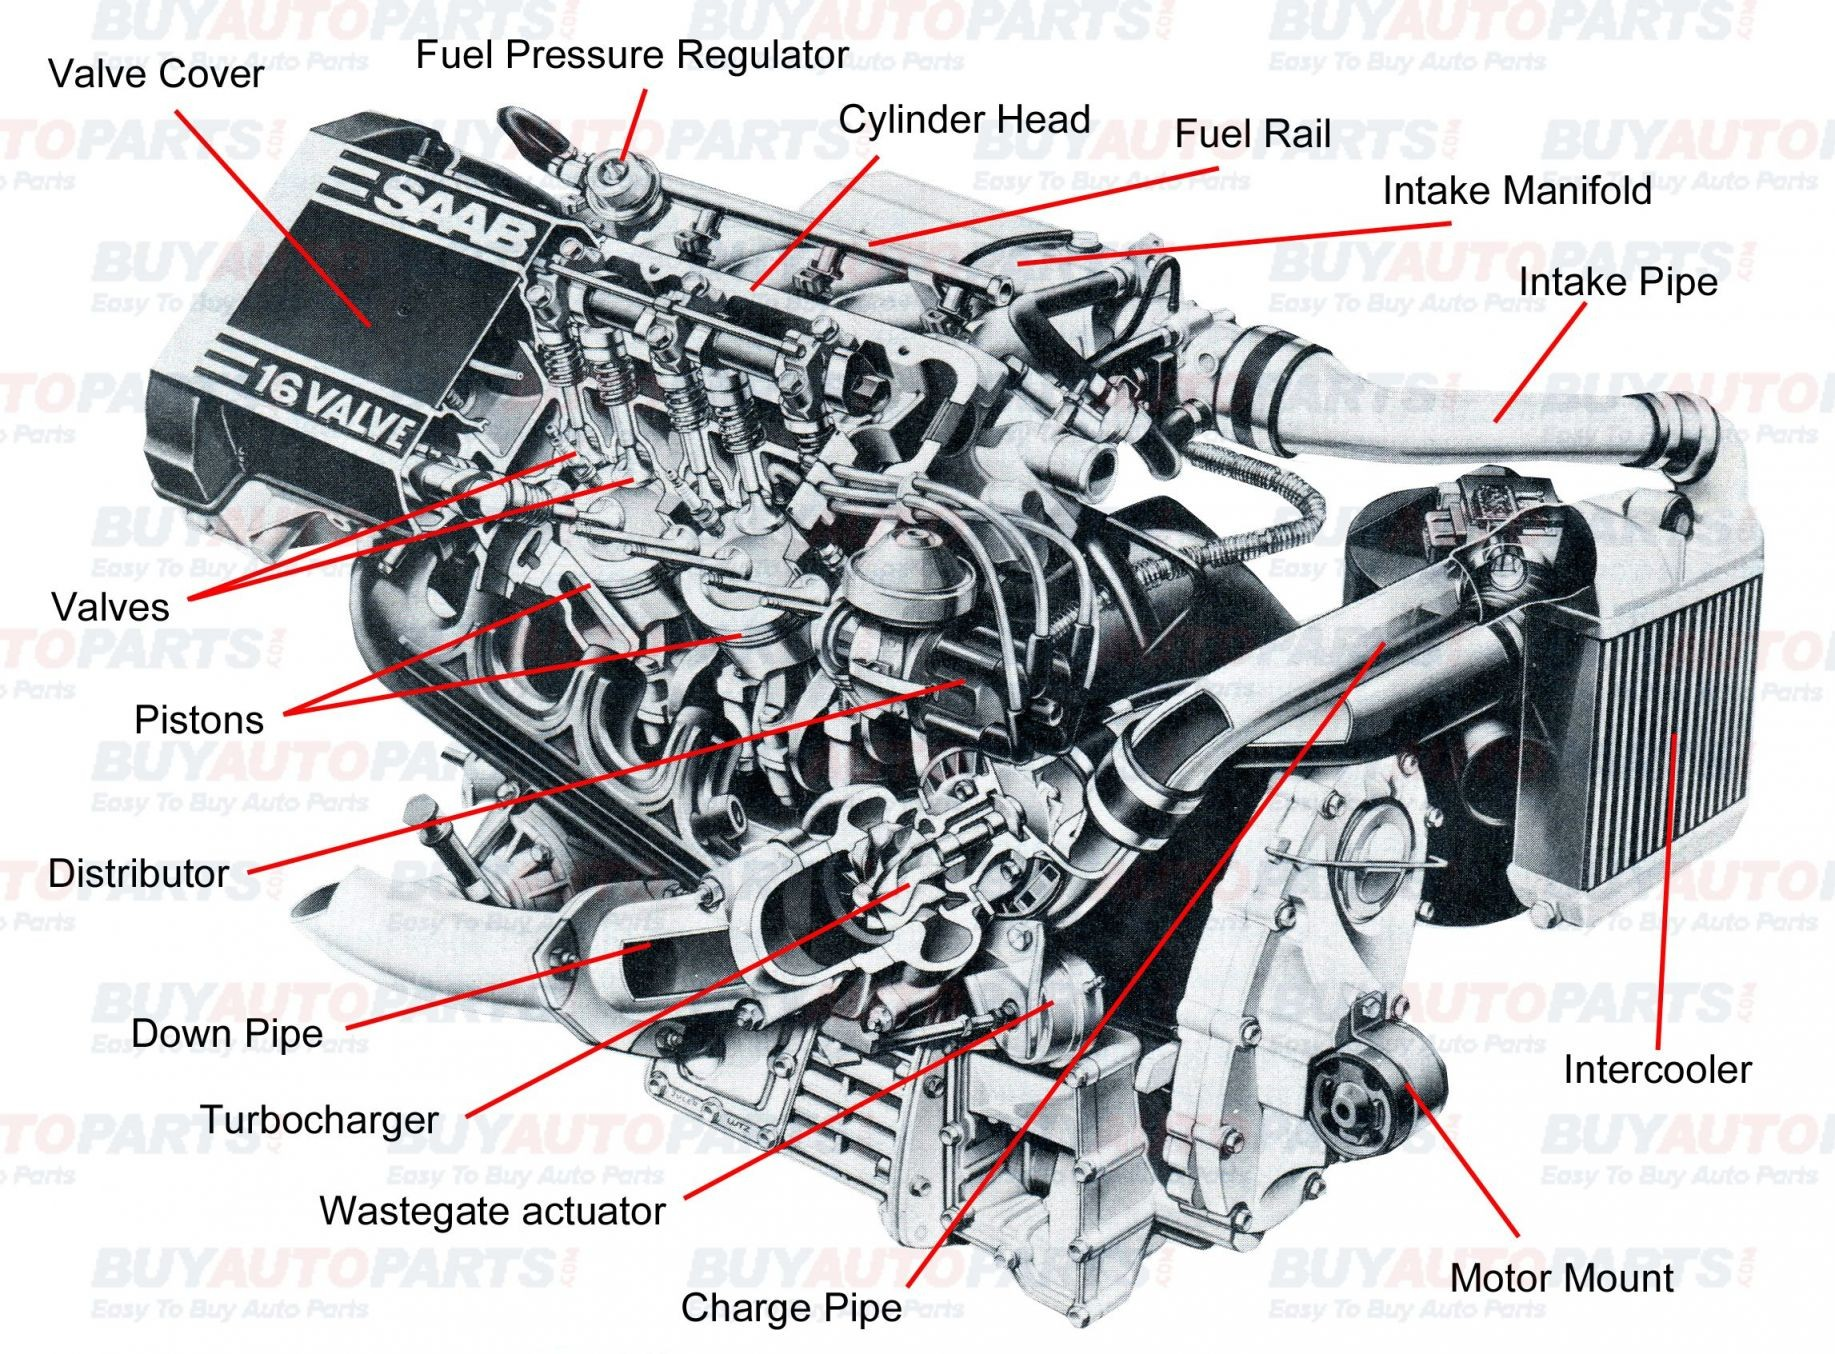 Ion Engine Diagram Unique Internal Parts A Car Et65 – Documentaries for Change Of Ion Engine Diagram